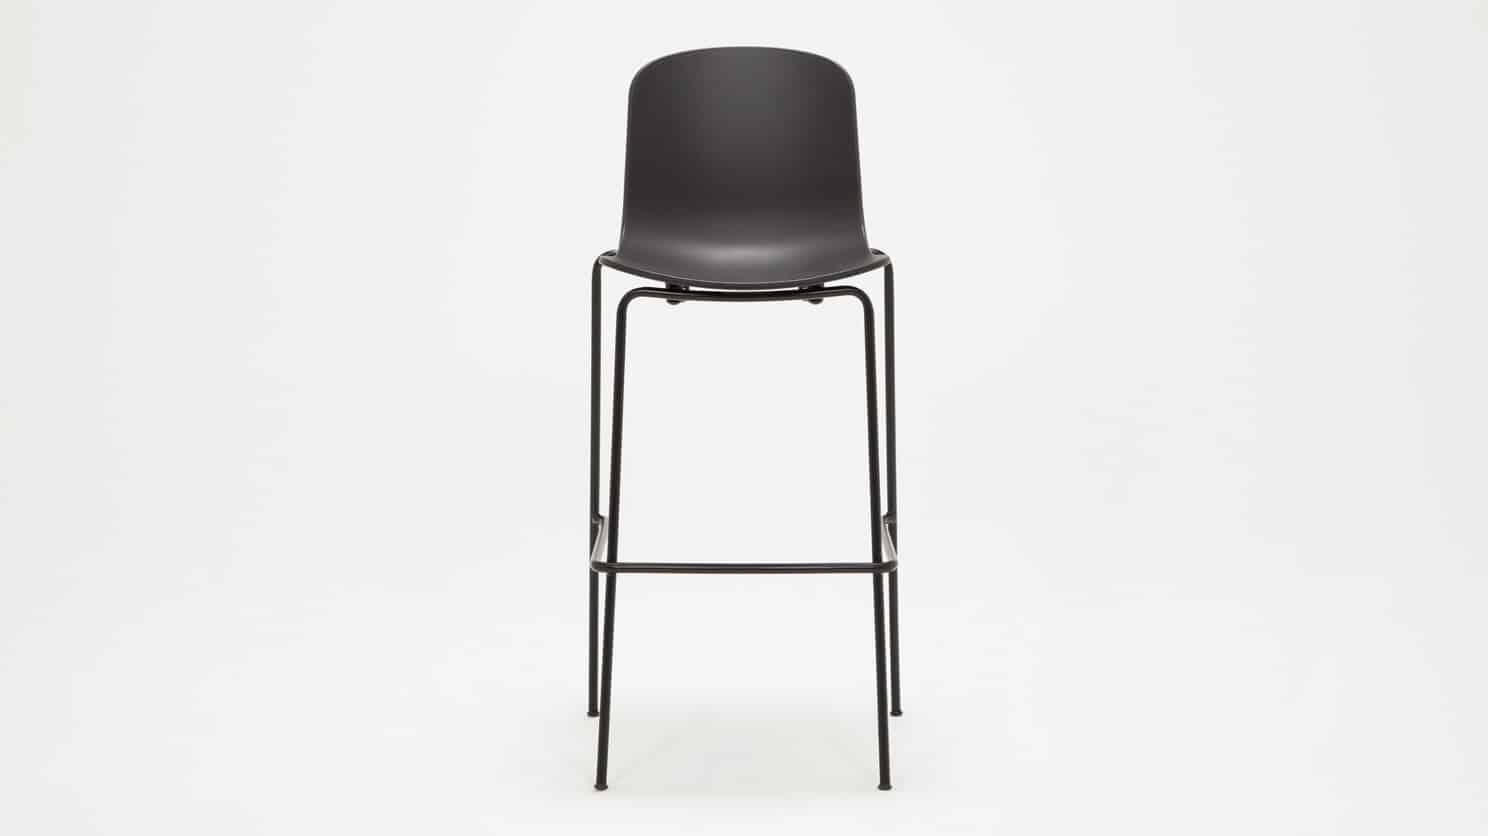 3020 293 par 5 stools holi bar stool black front 02